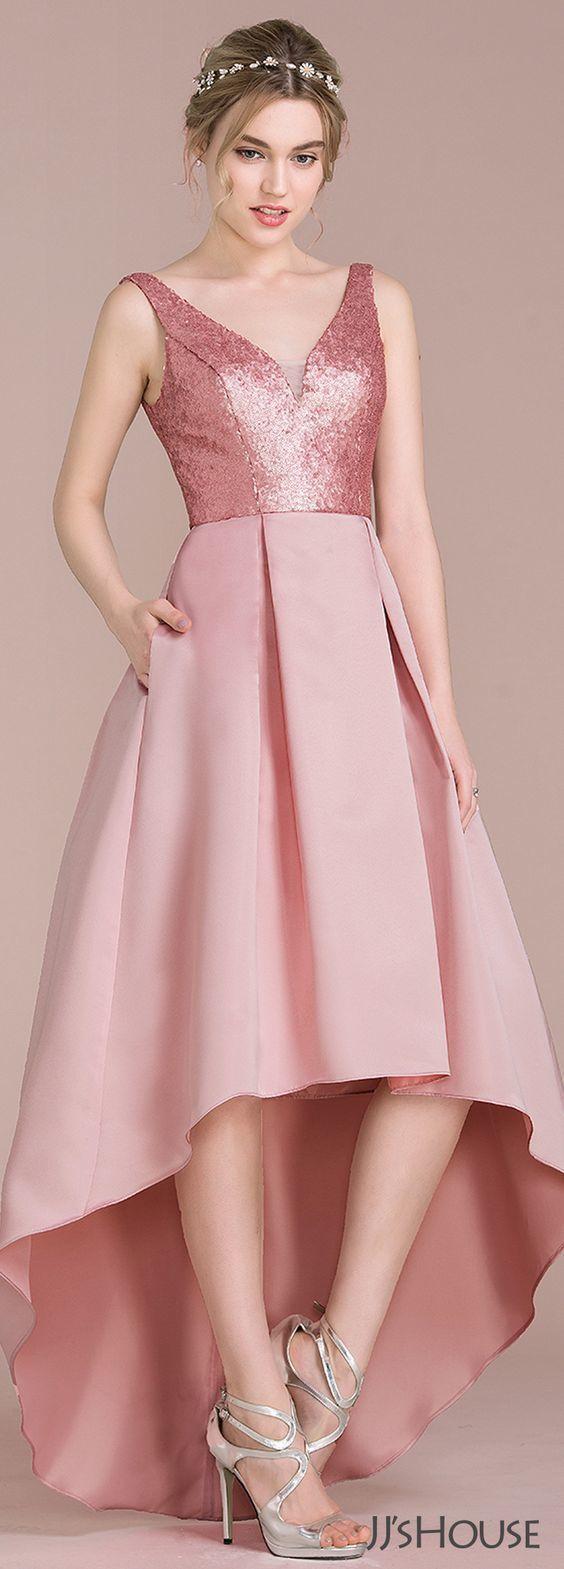 2751cf65bd62 A-Line/Princess V-neck, Asymmetrical Satin, Sequined Bridesmaid Dress,High  Low Prom Dress,Sexy Party Dress,Custom Made Evening Dress by prom dresses,  ...